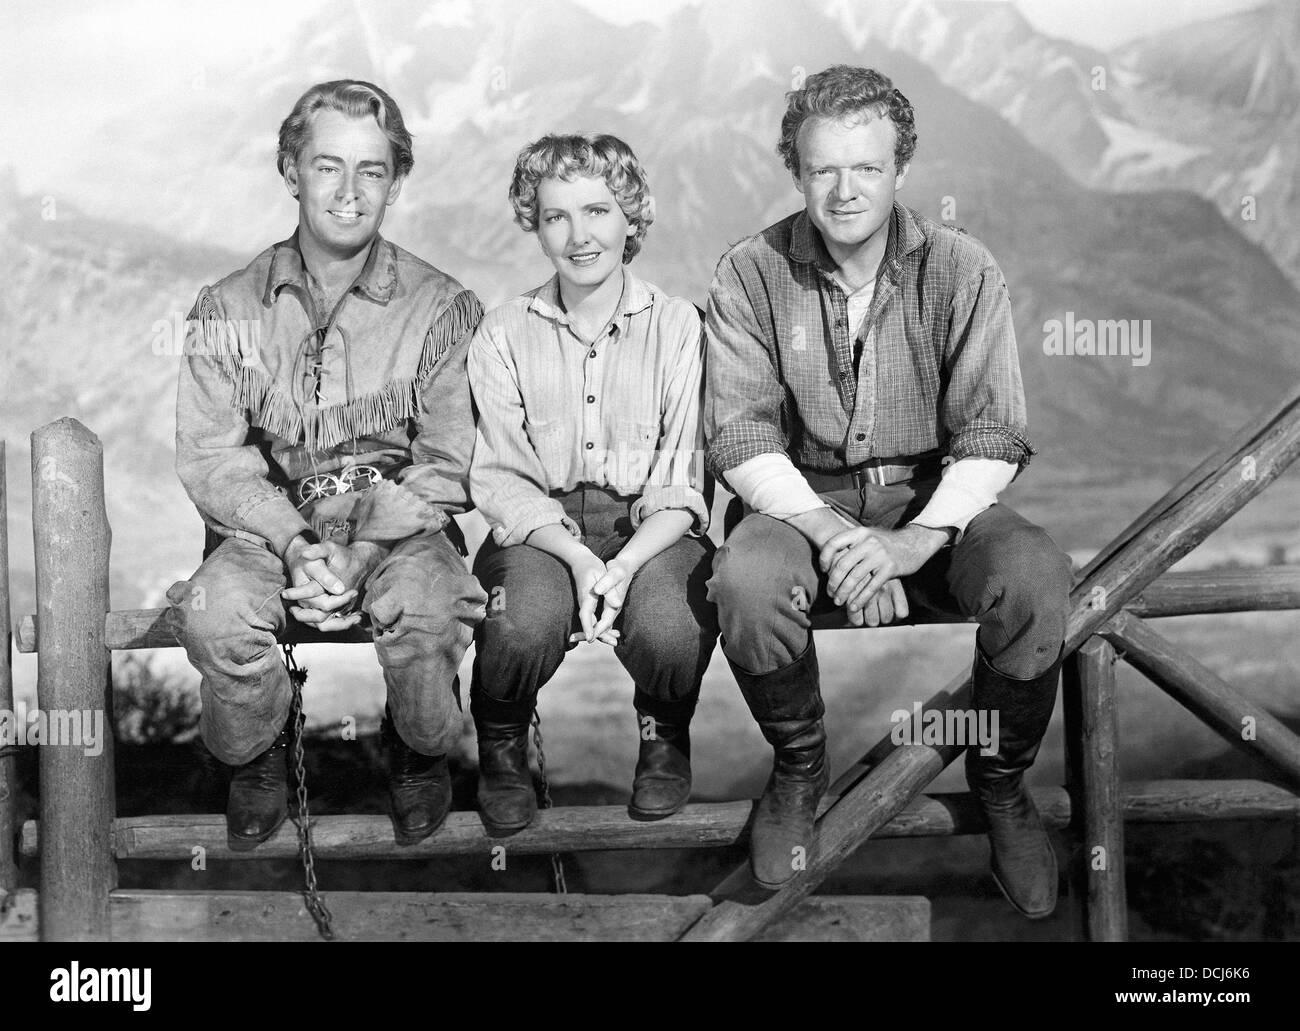 SHANE - Alan Ladd, Jean Arthur, Van Heflin - Directed by George Stevens - Paramount, 1953. - Stock Image